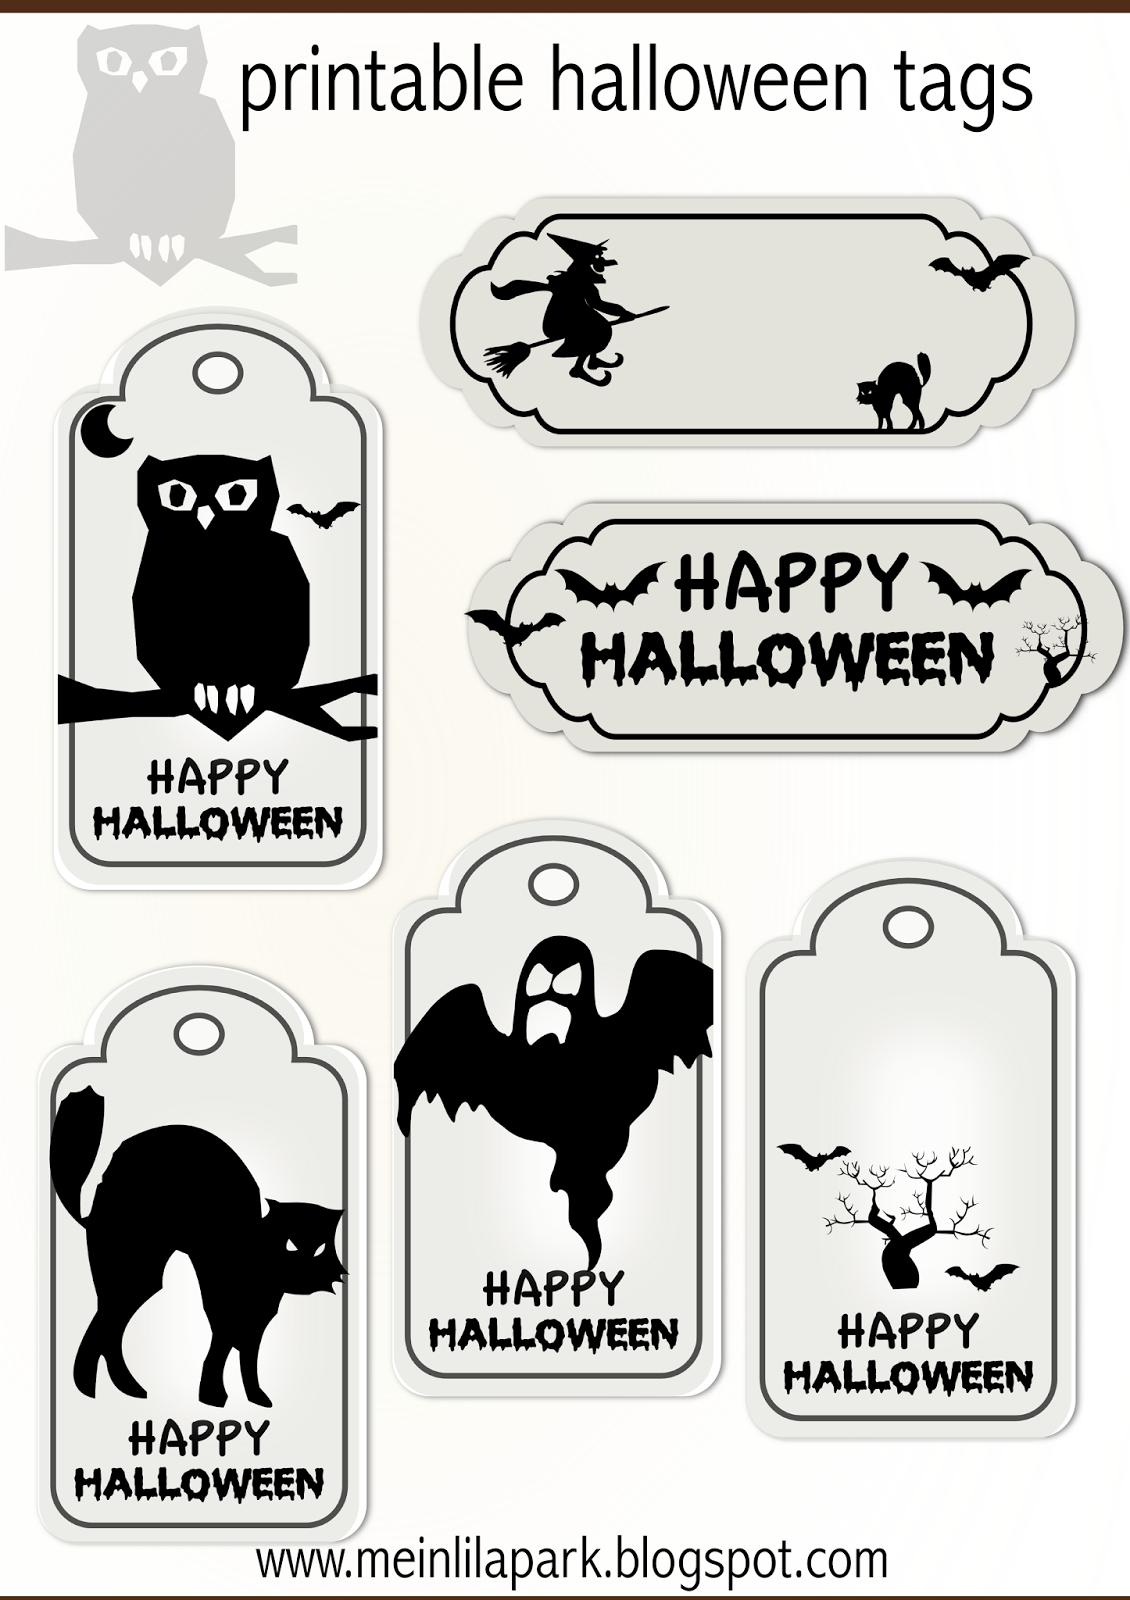 Free Printable Halloween Tags - Druckvorlage Halloween - Freebie - Free Printable Halloween Tags